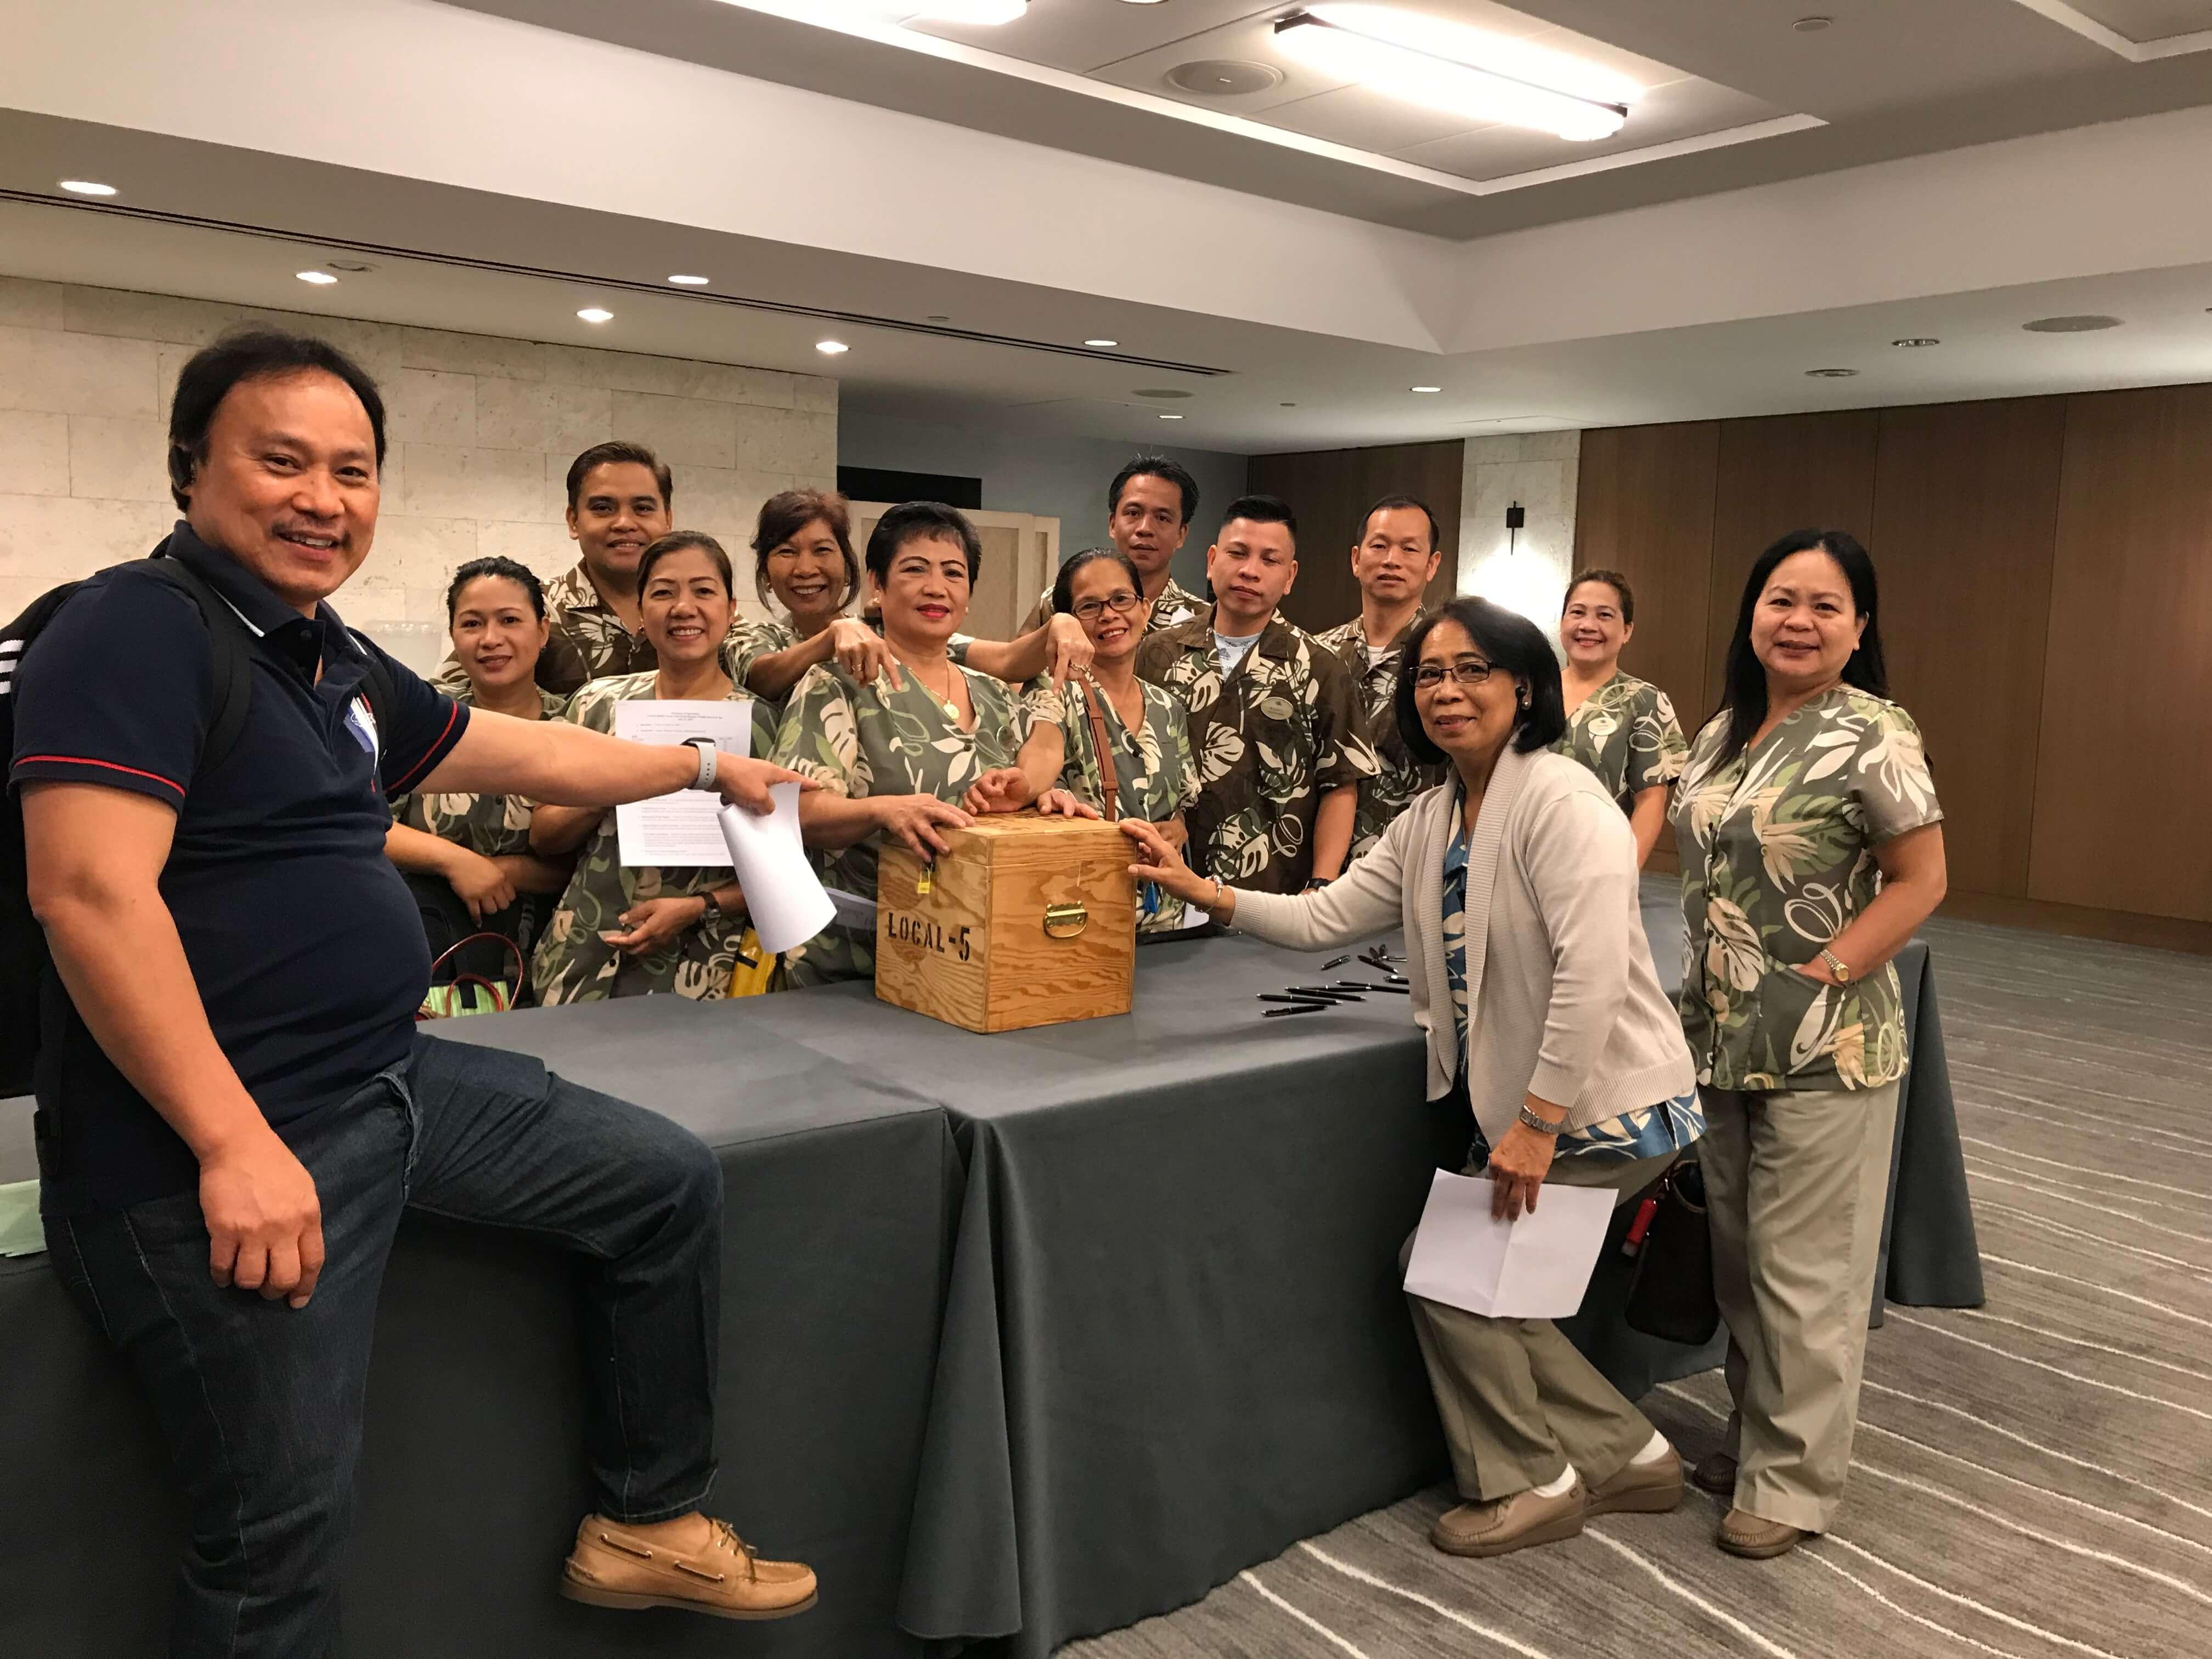 Hyatt Regency Waikiki avoided strike